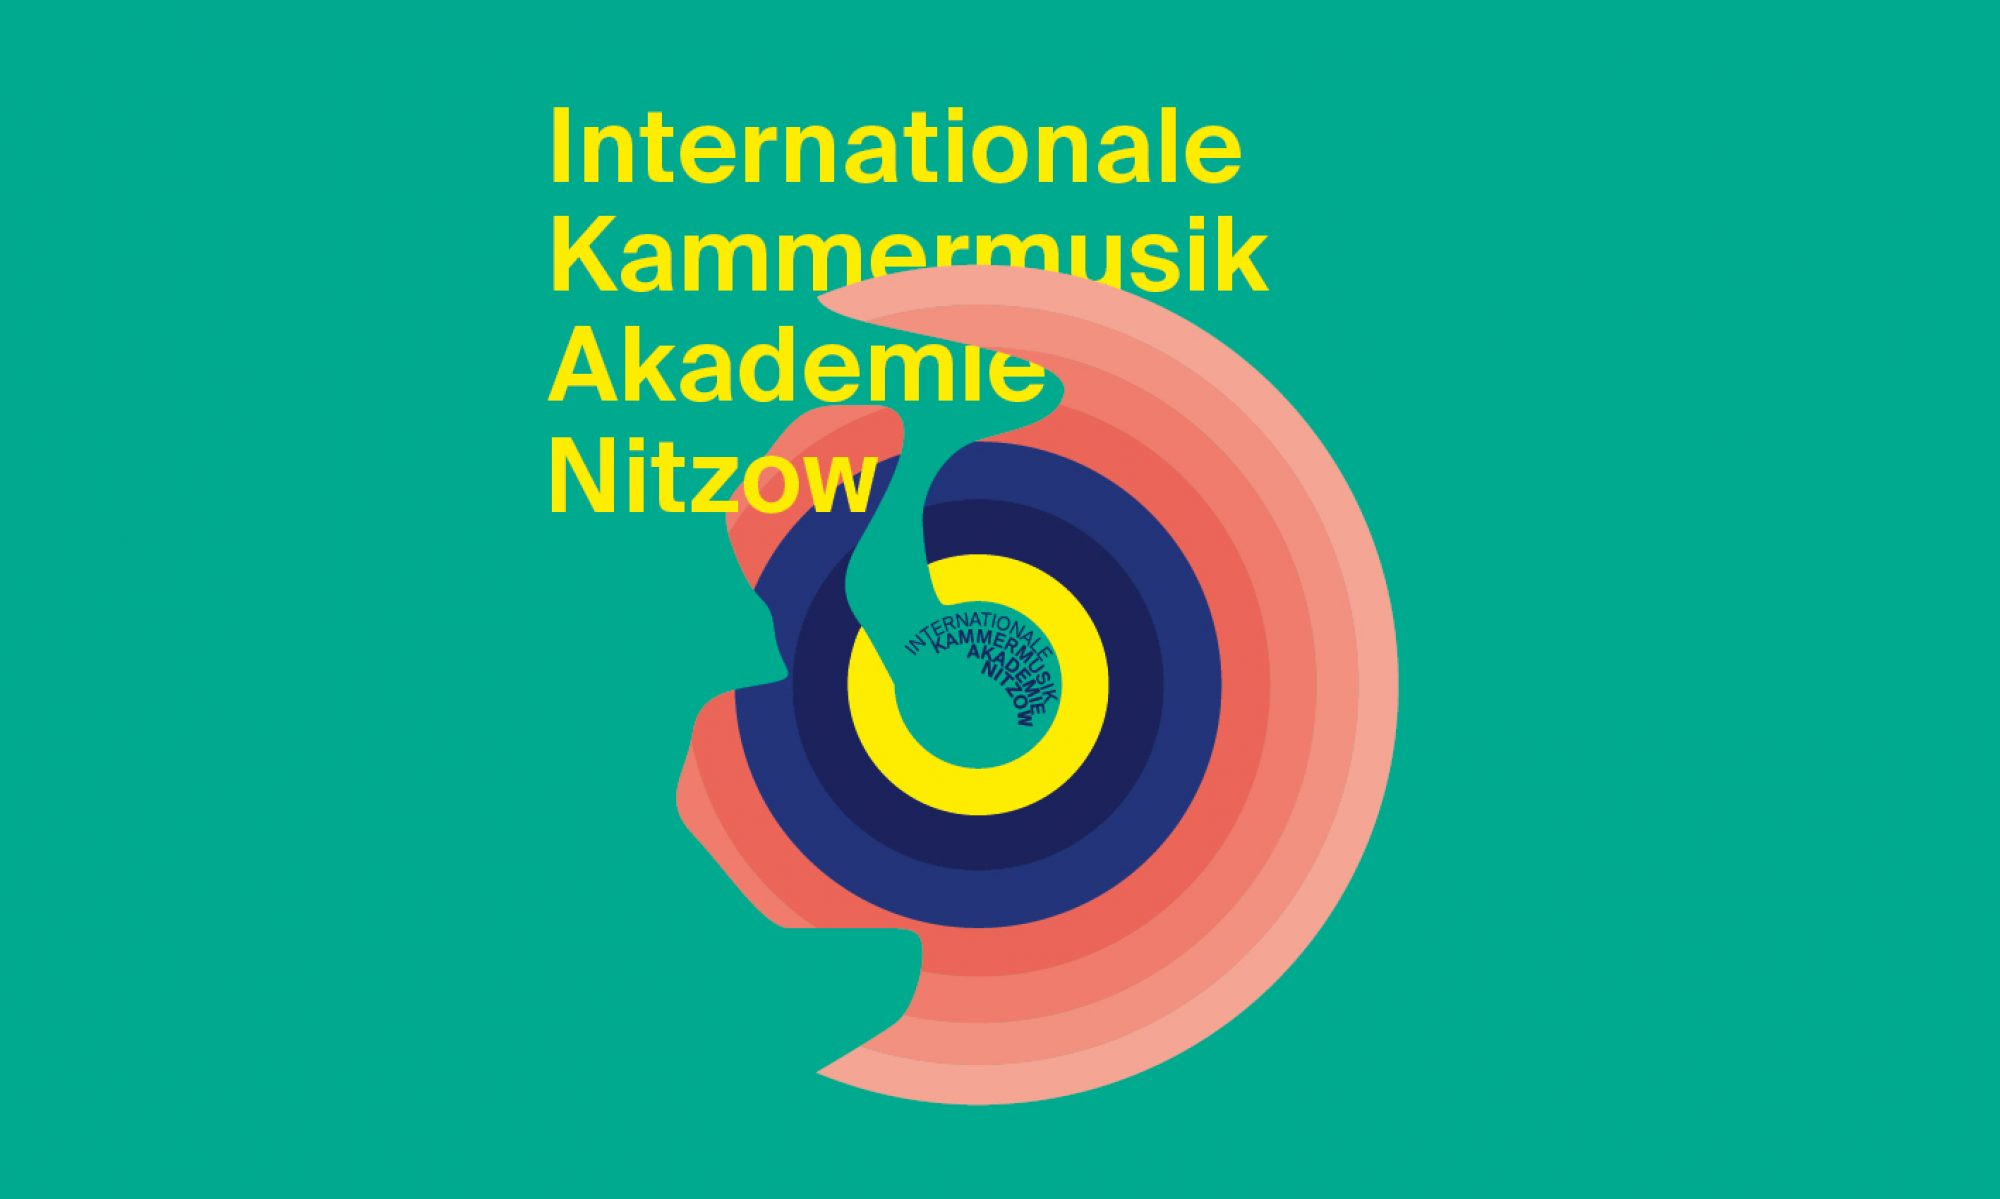 Internationale Kammermusik Akademie Nitzow